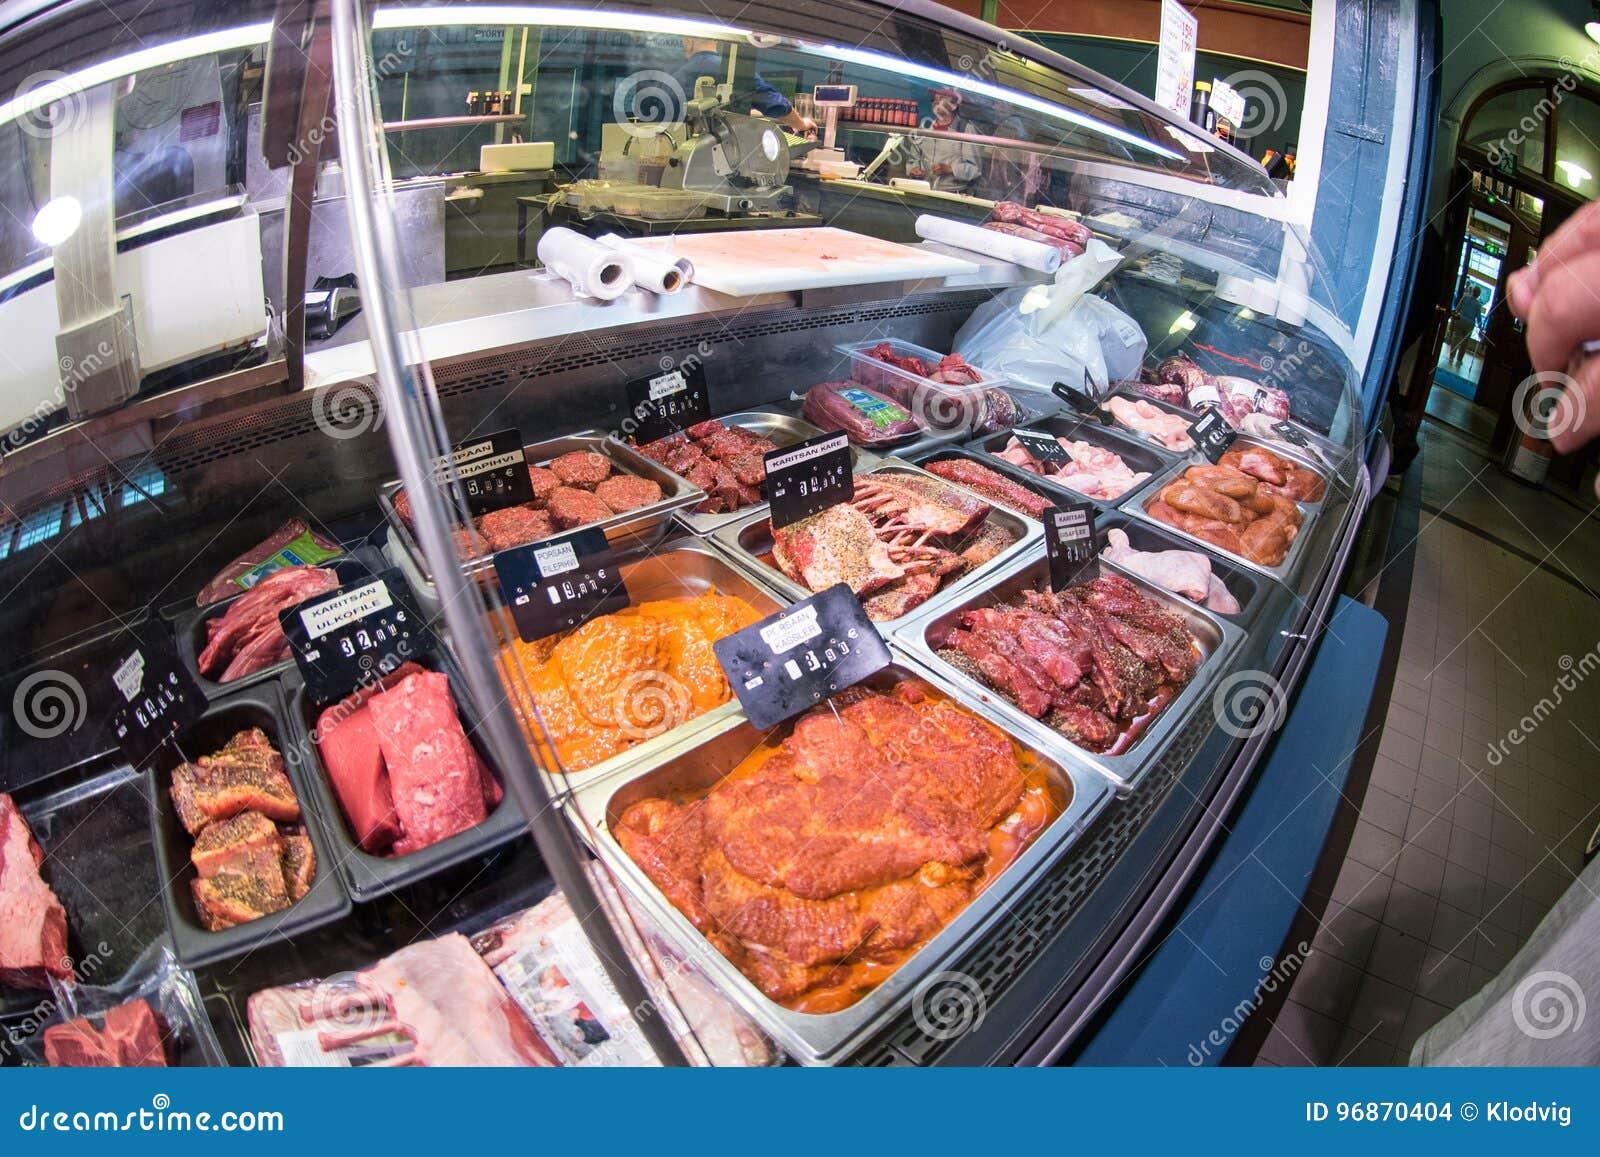 Meat vendor in Tampere Kauppahalli